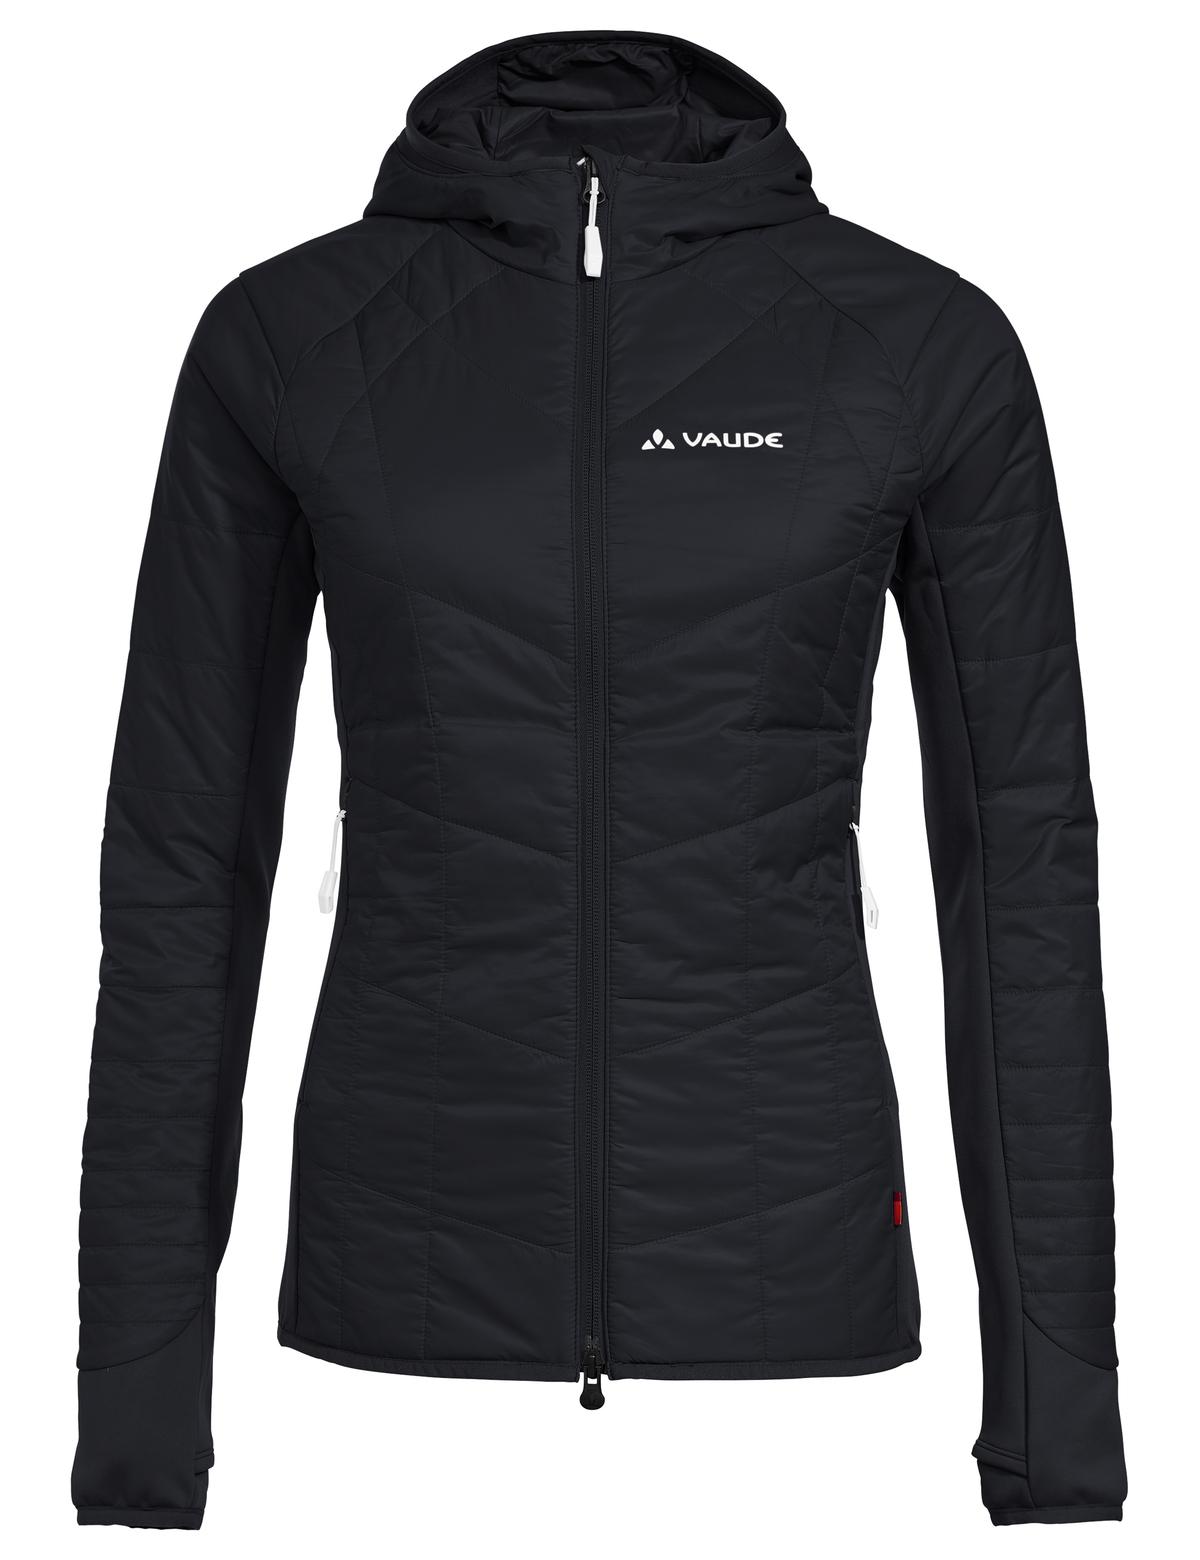 Vaude Women's Sesvenna Jacket III - Softshelljacke - Damen